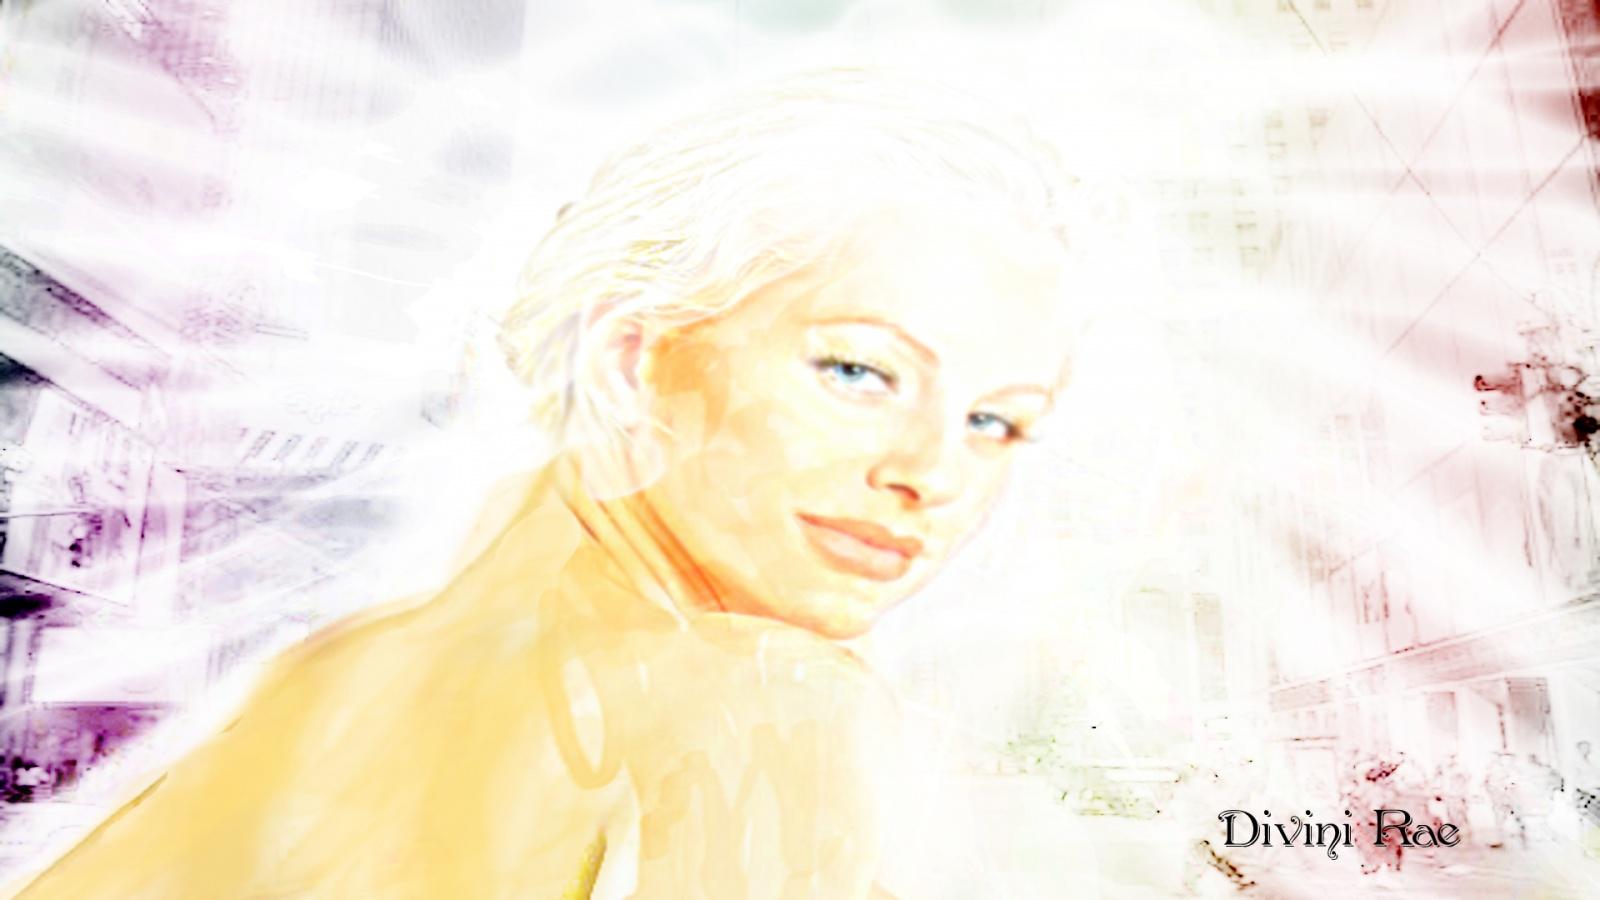 Divini Rae Sorenson angel like portrait graphic wallpaper